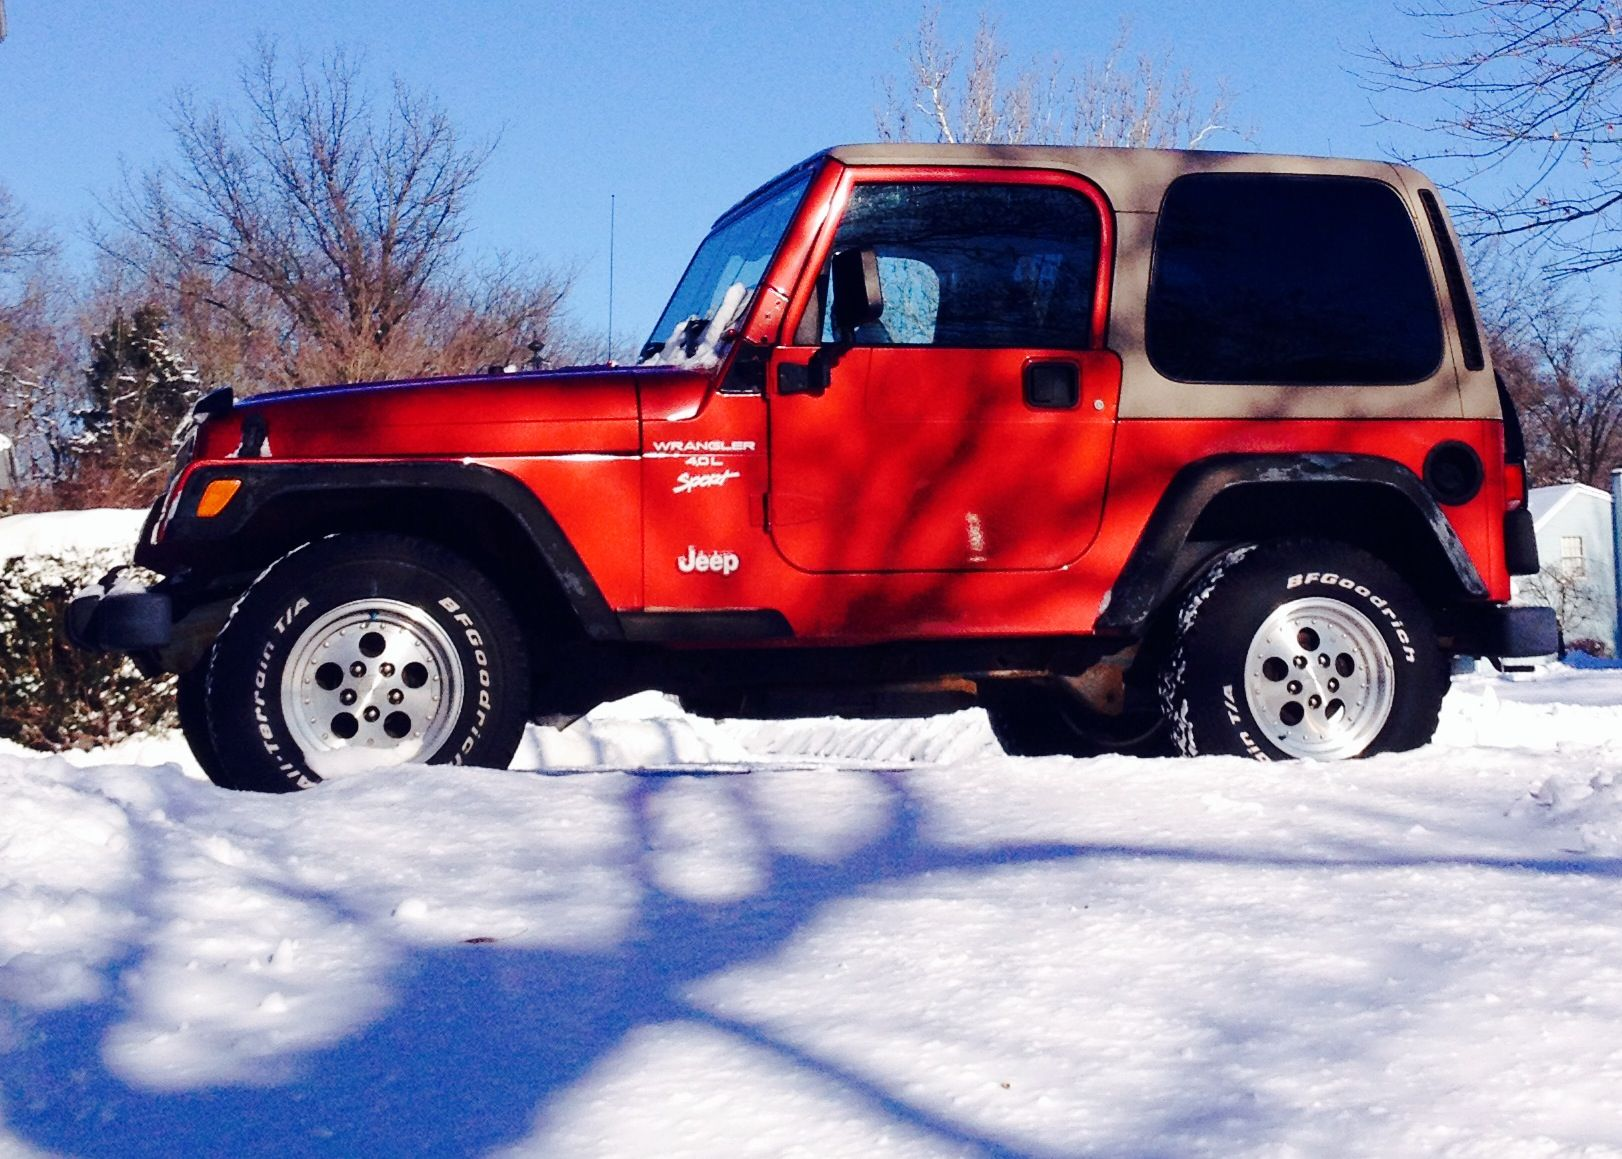 Red Jeep Tan Hardtop Looks Like The Jeep My Hubs Had Red Jeep Jeep Tj Jeep Wrangler Sport